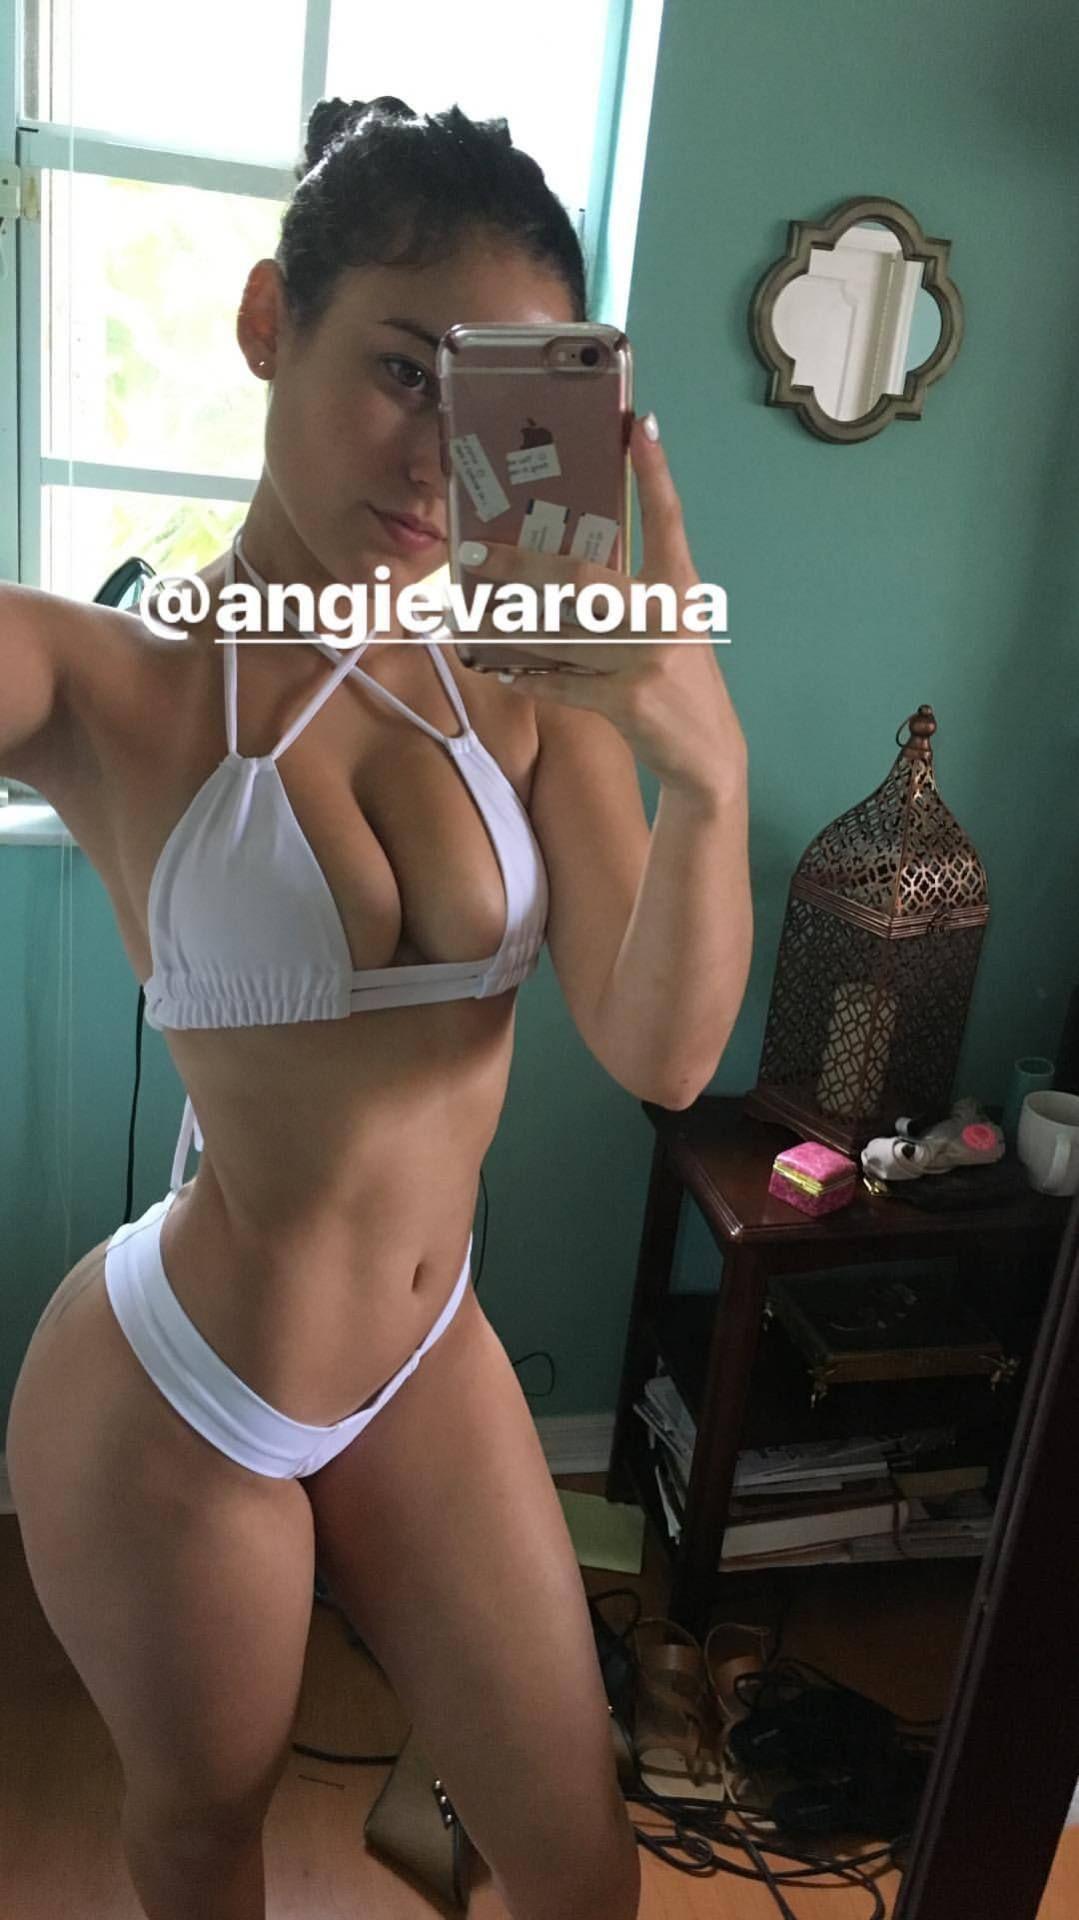 a1cb3f5cb6 Angie Varona Picture Gallery   Photo Mujer Bonita